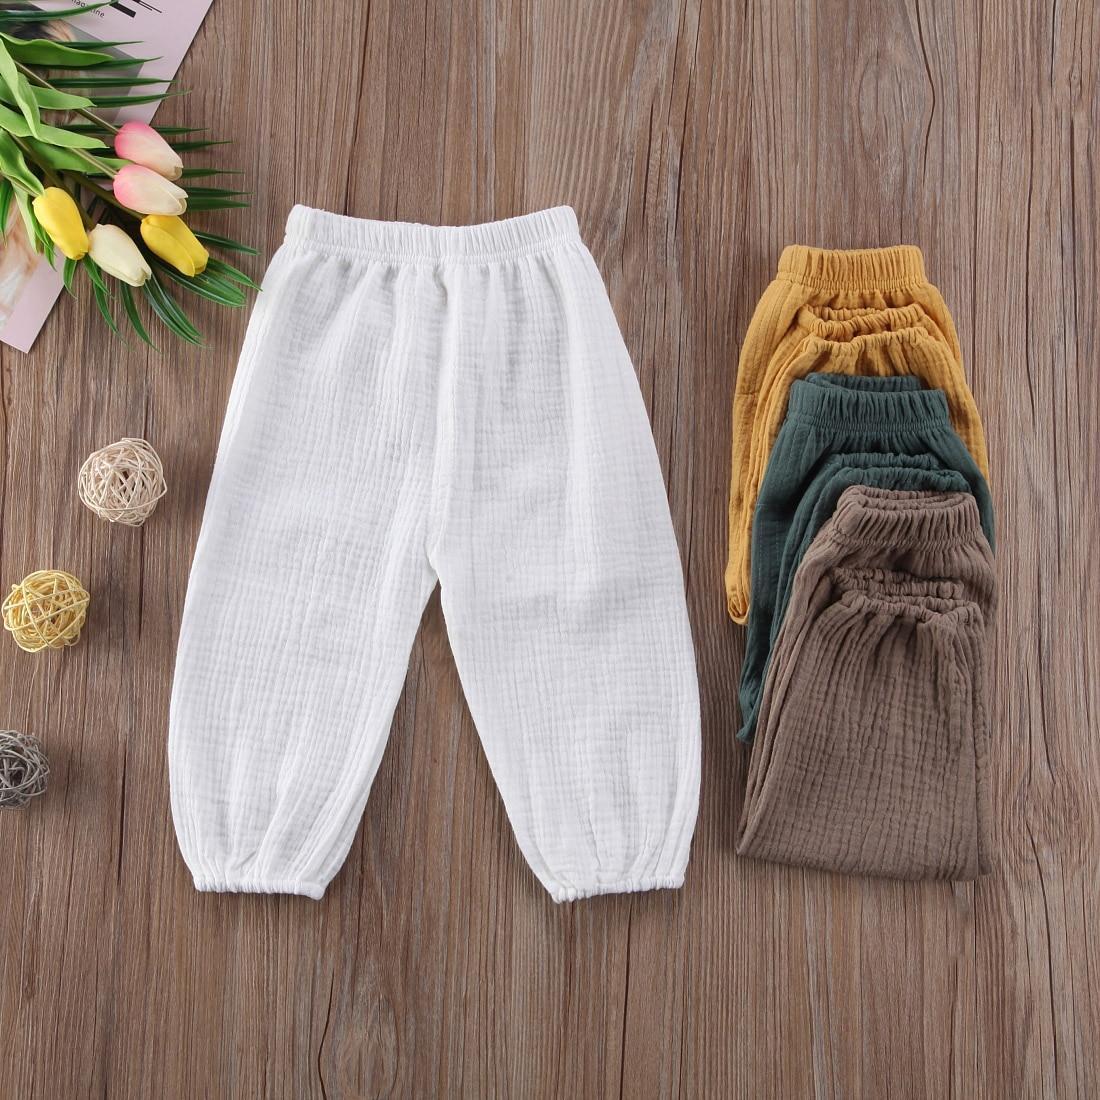 Legging Trouser Pant Toddler Girls Boys Cotton Baby Kids Solid Casual Soft PP Long